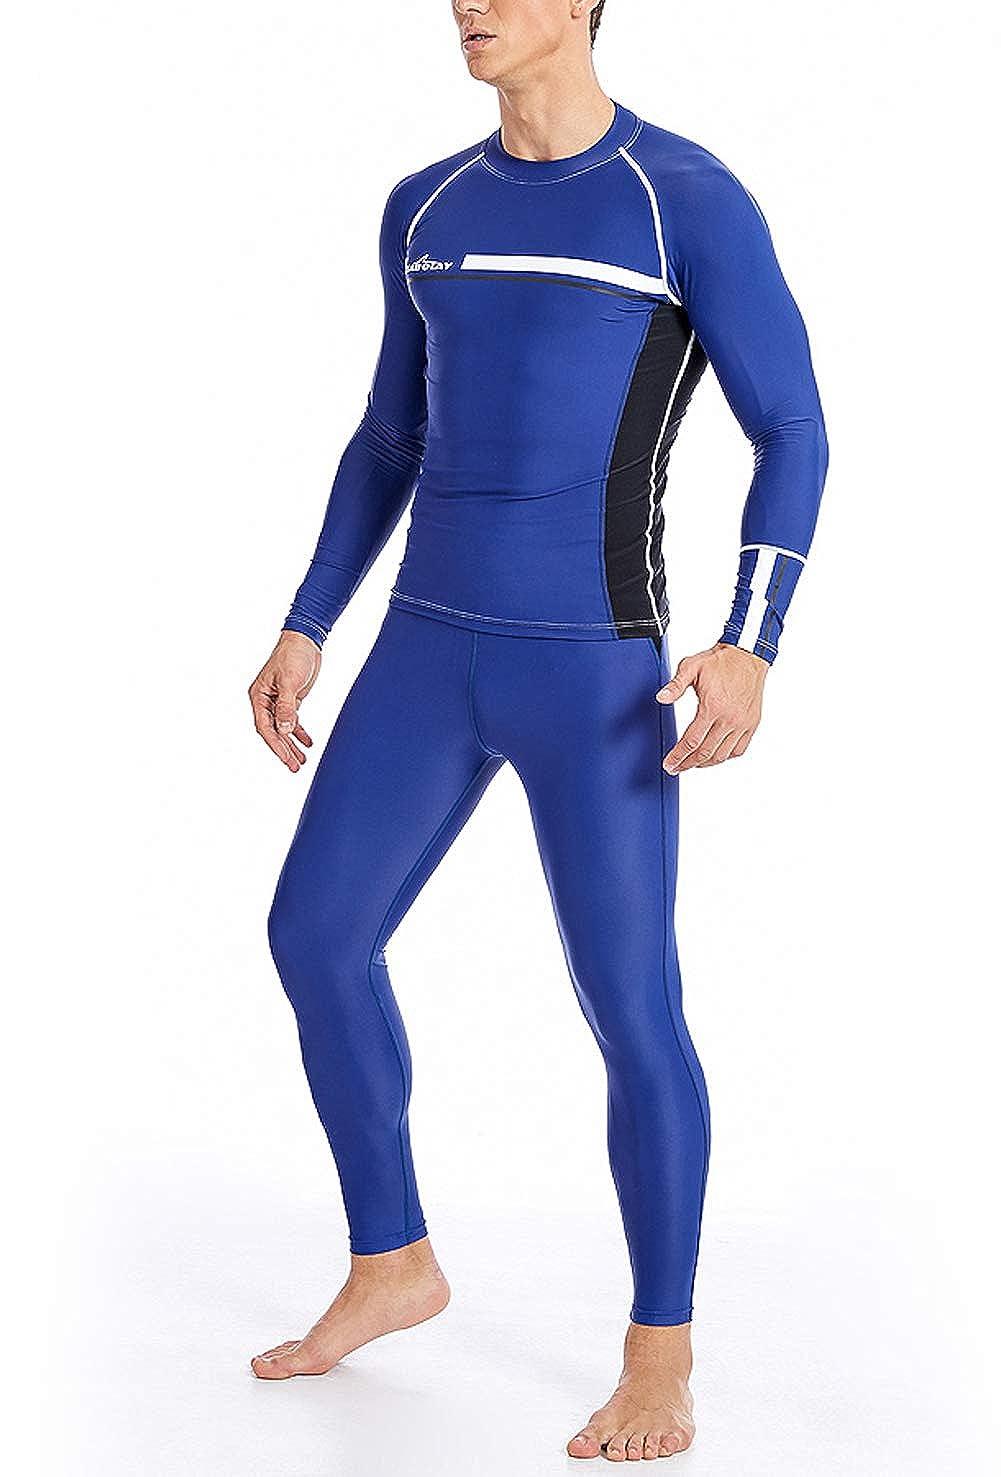 SABOLAY Men Long Sleeve Rashguard Shirts Breathable UPF 50 Quick Dry Swimwear